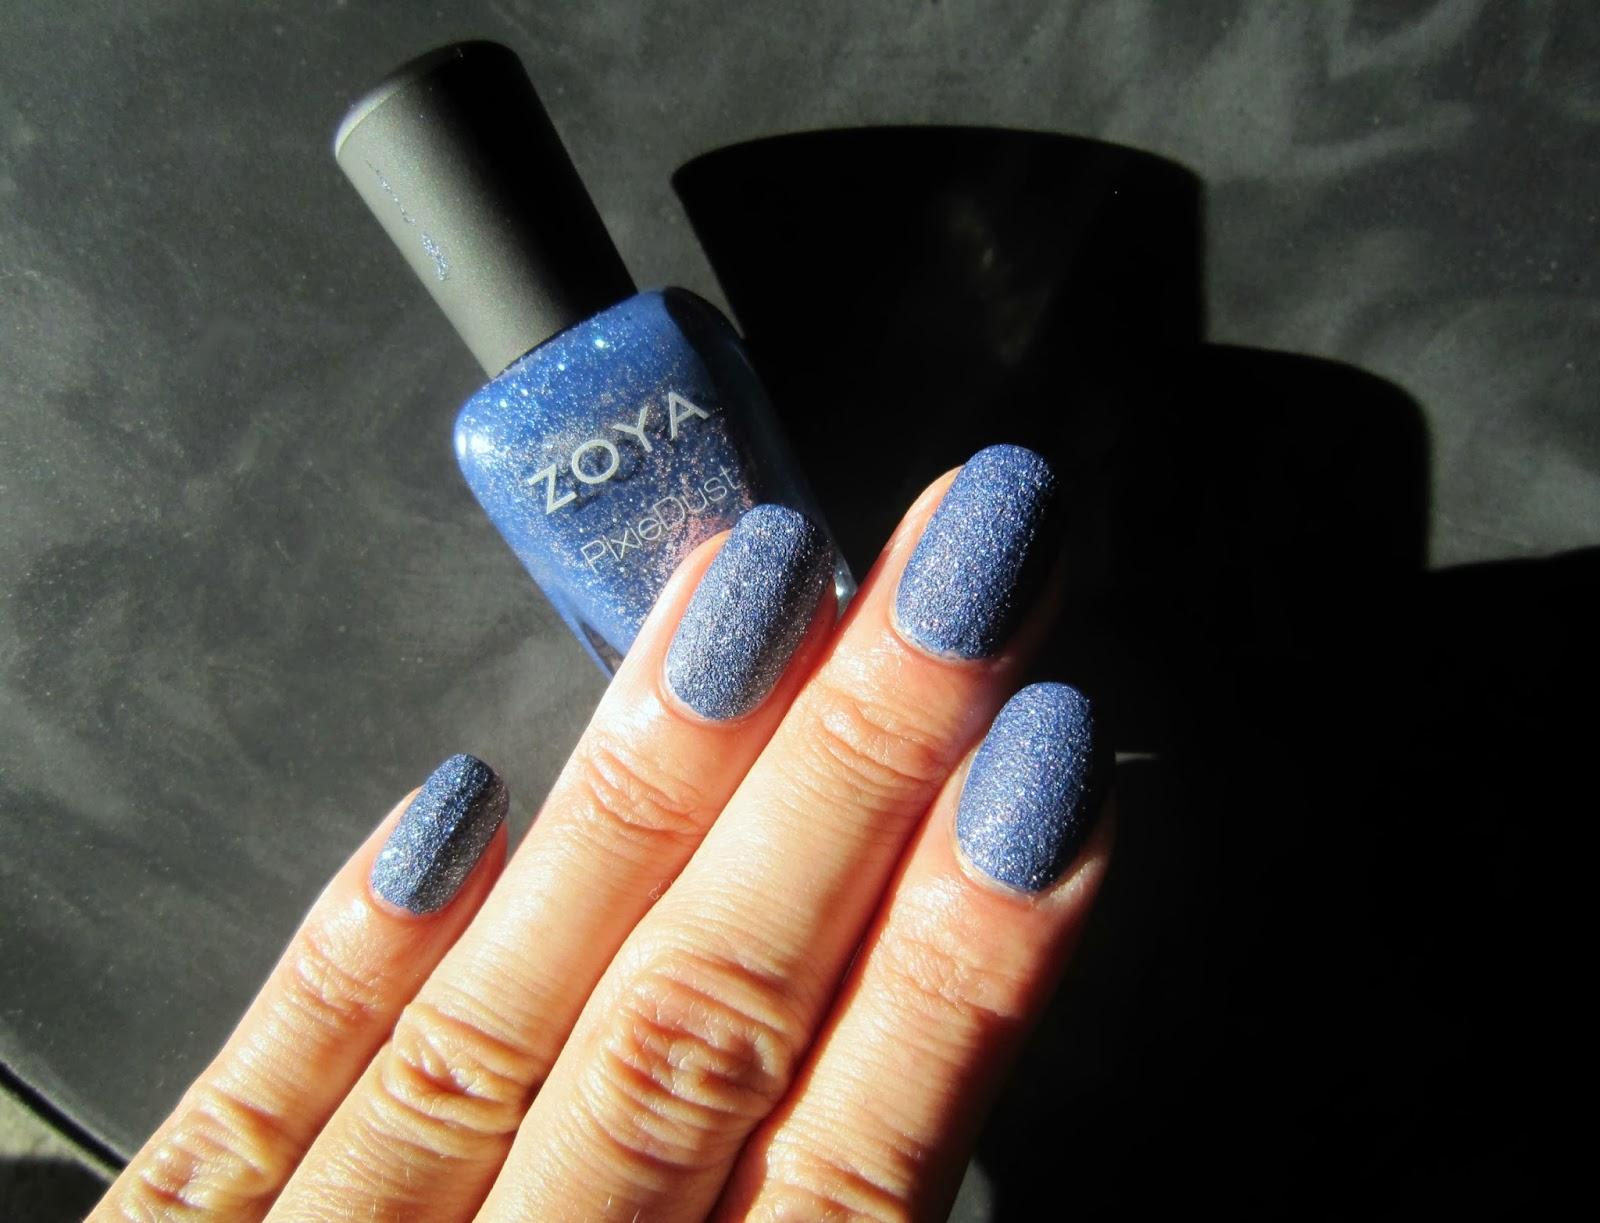 Zoya-Sunshine-Pixie-Dust- 011  9  jpgZoya Sunshine Pixie Dust